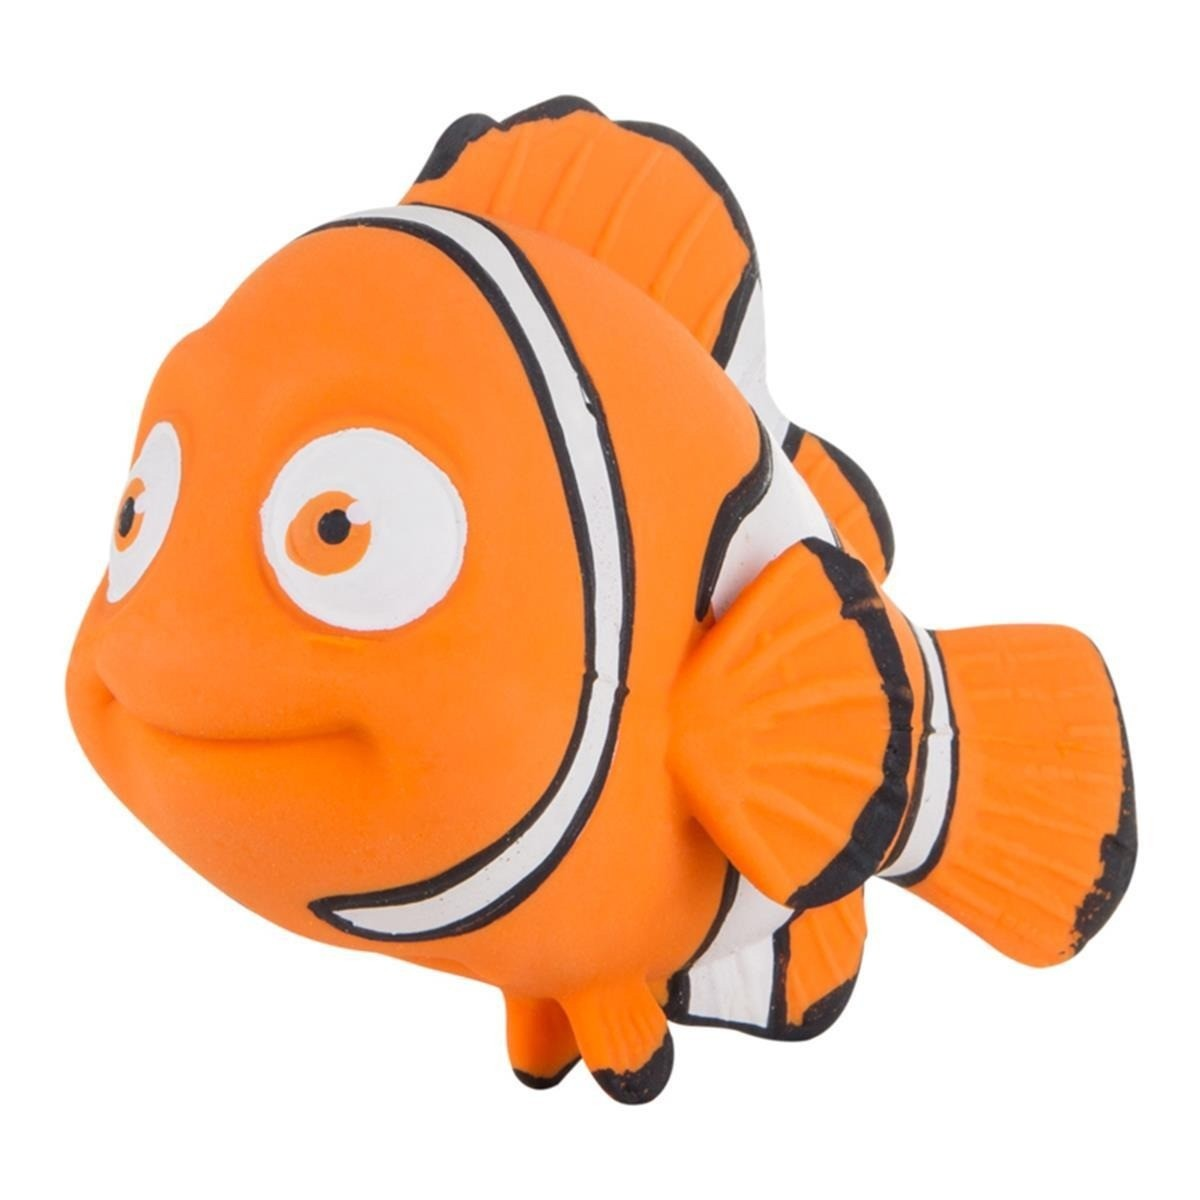 Mordedor para Bebe Nemo - Latoy